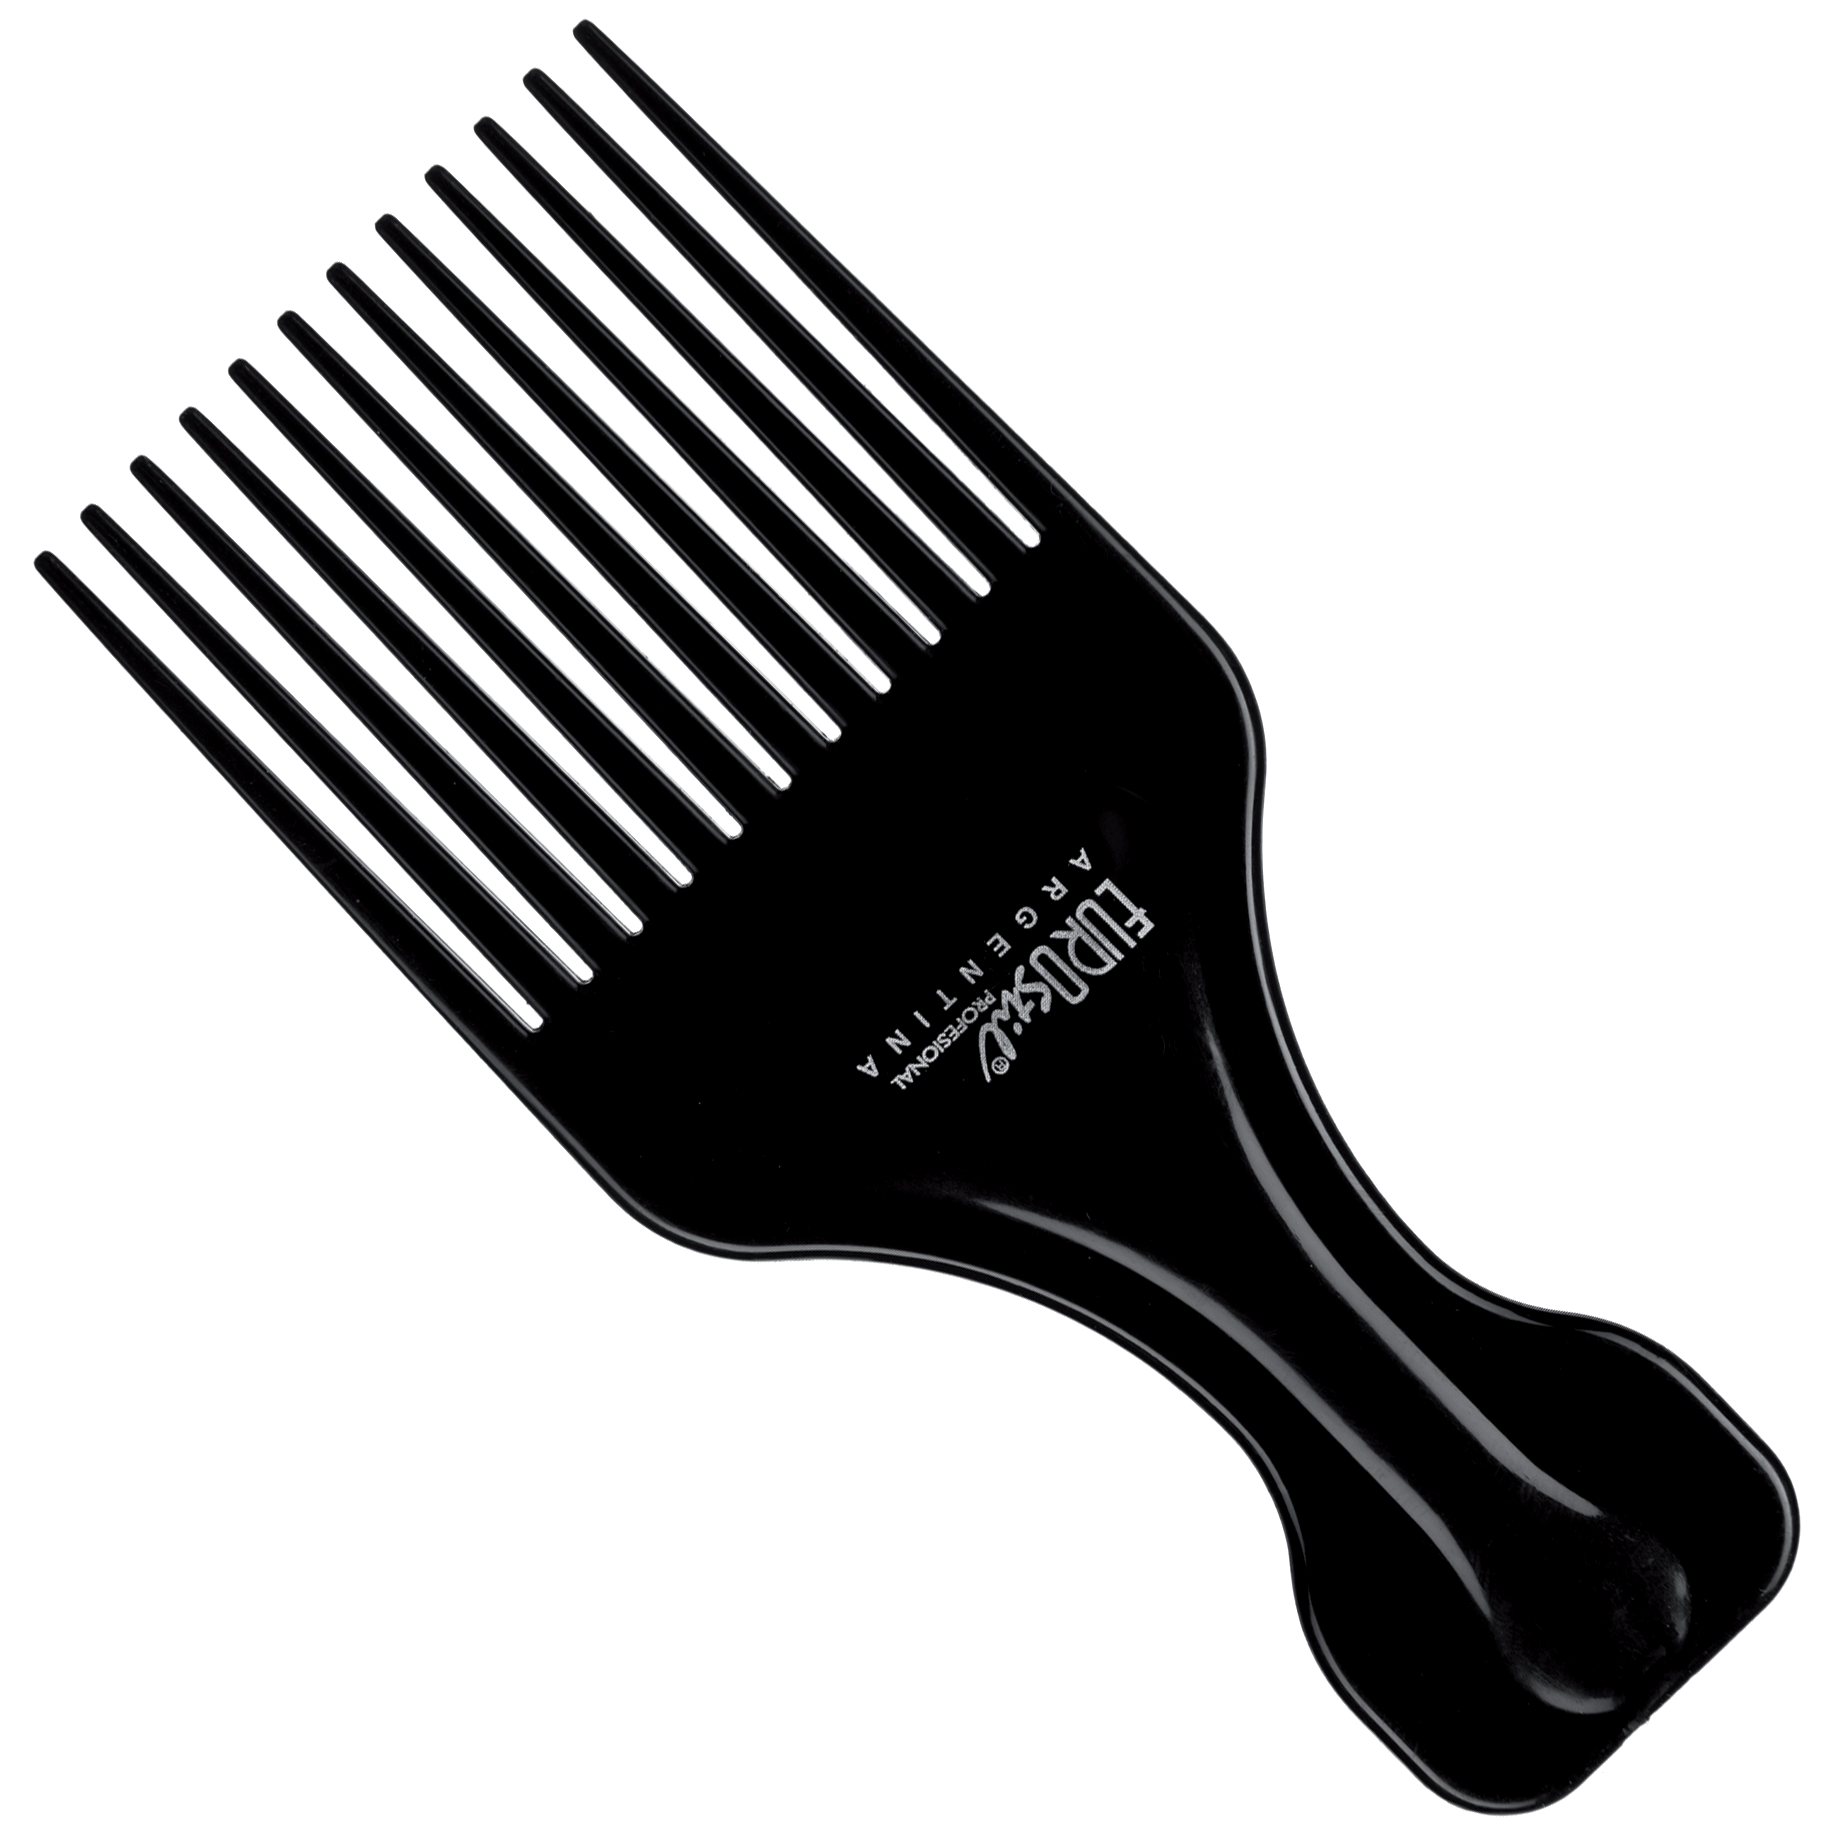 Peine tenedor bolsa individual #50403